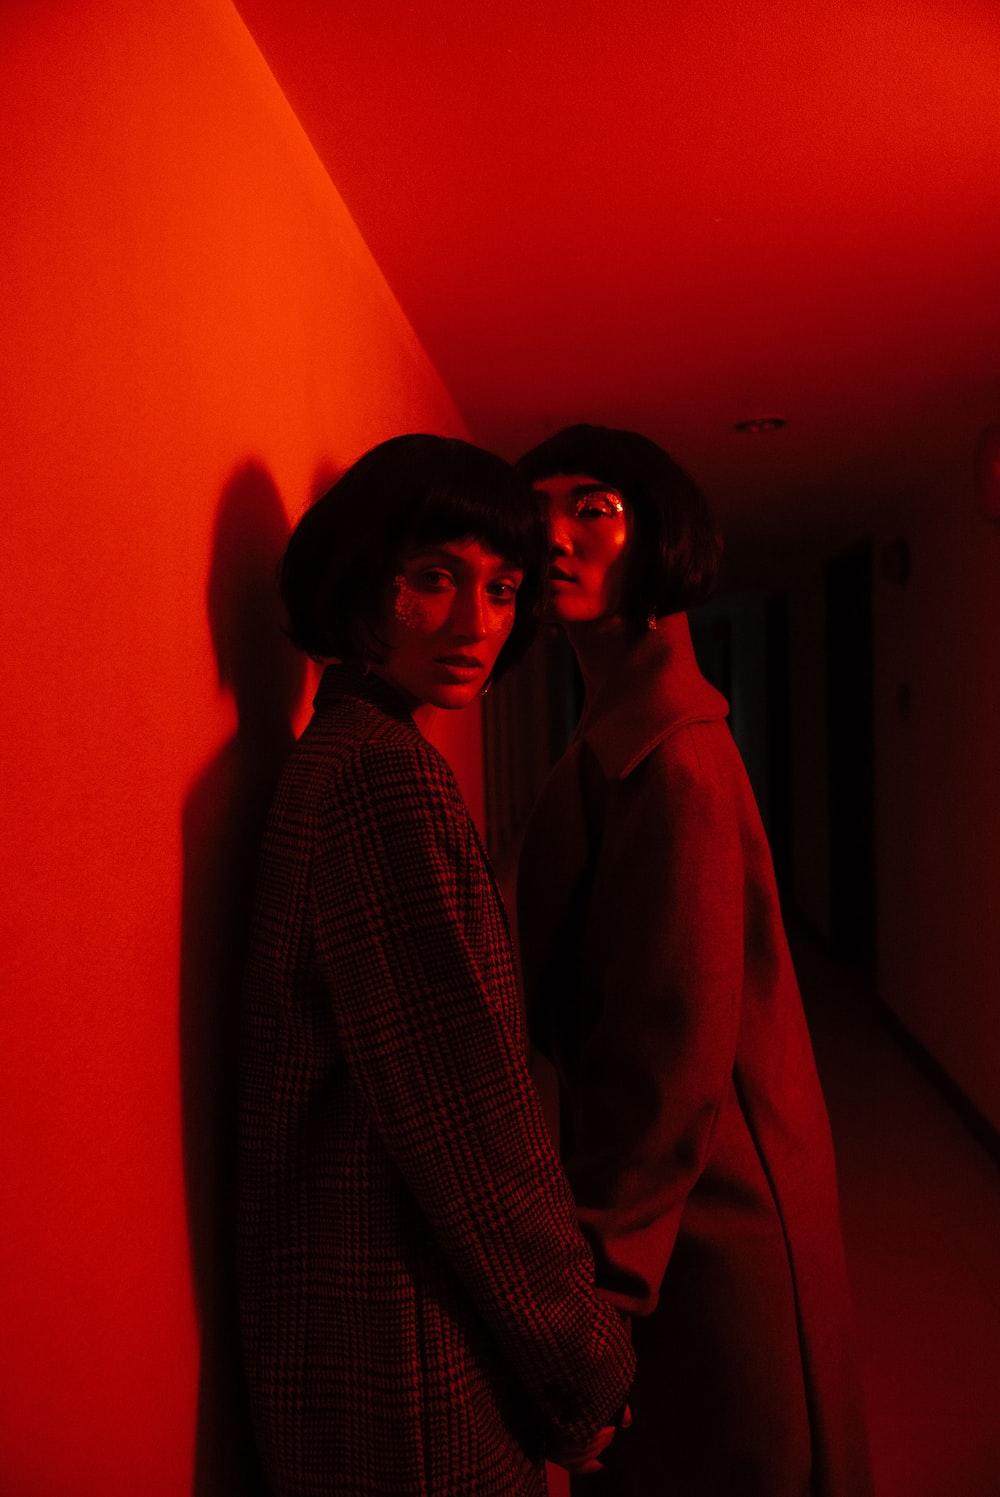 two woman wearing coat standing near wall